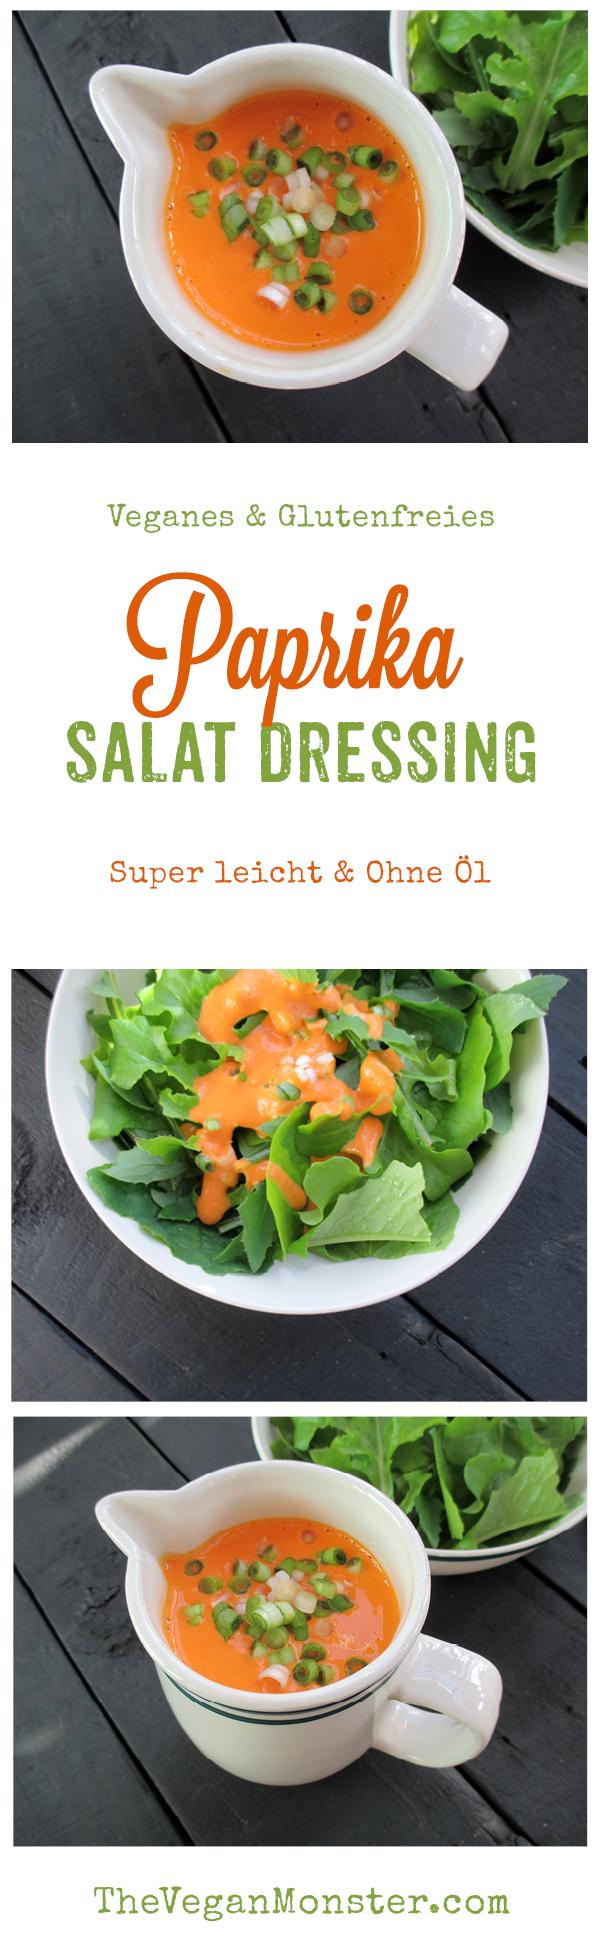 Veganes Glutenfreies Super Einfaches Paprika Salat Dressing Ohne Oel Rezept